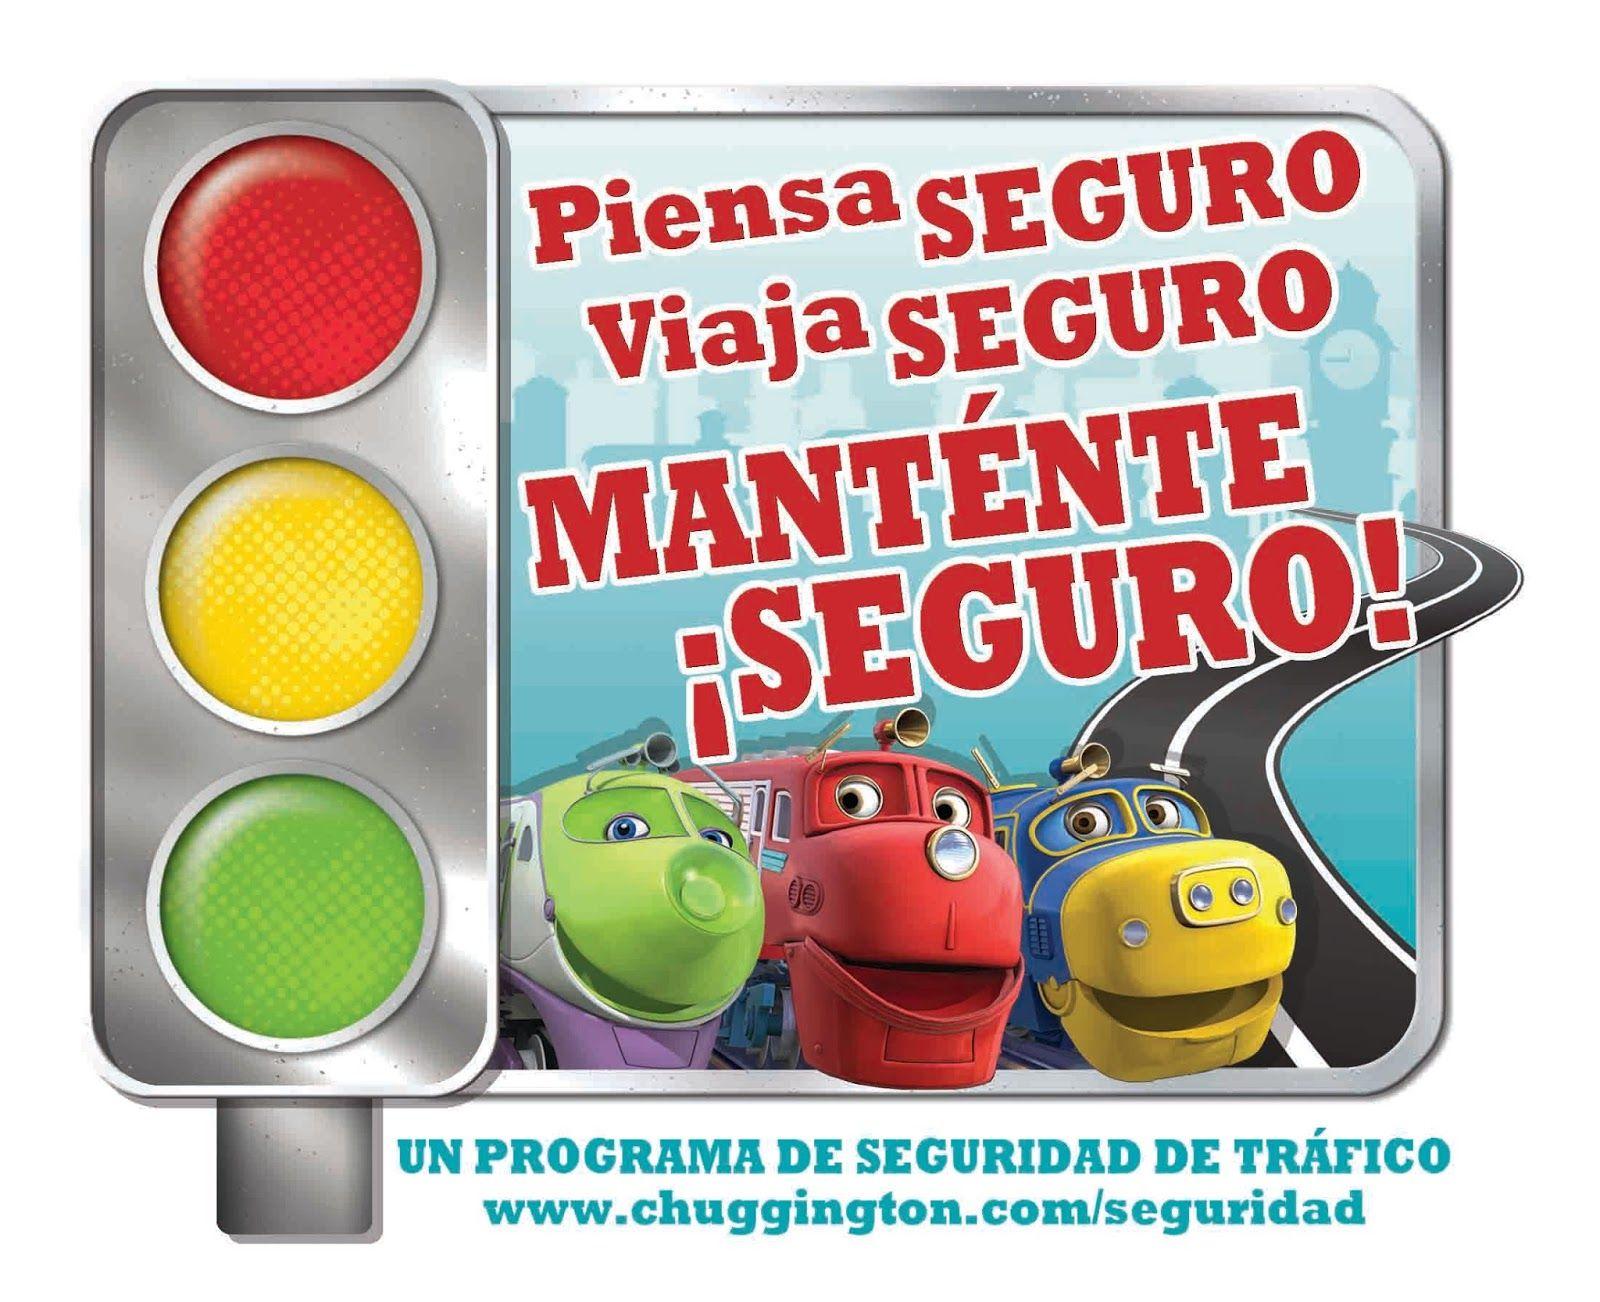 New Spanish Website for Children Teaches Traffic Safety # ...